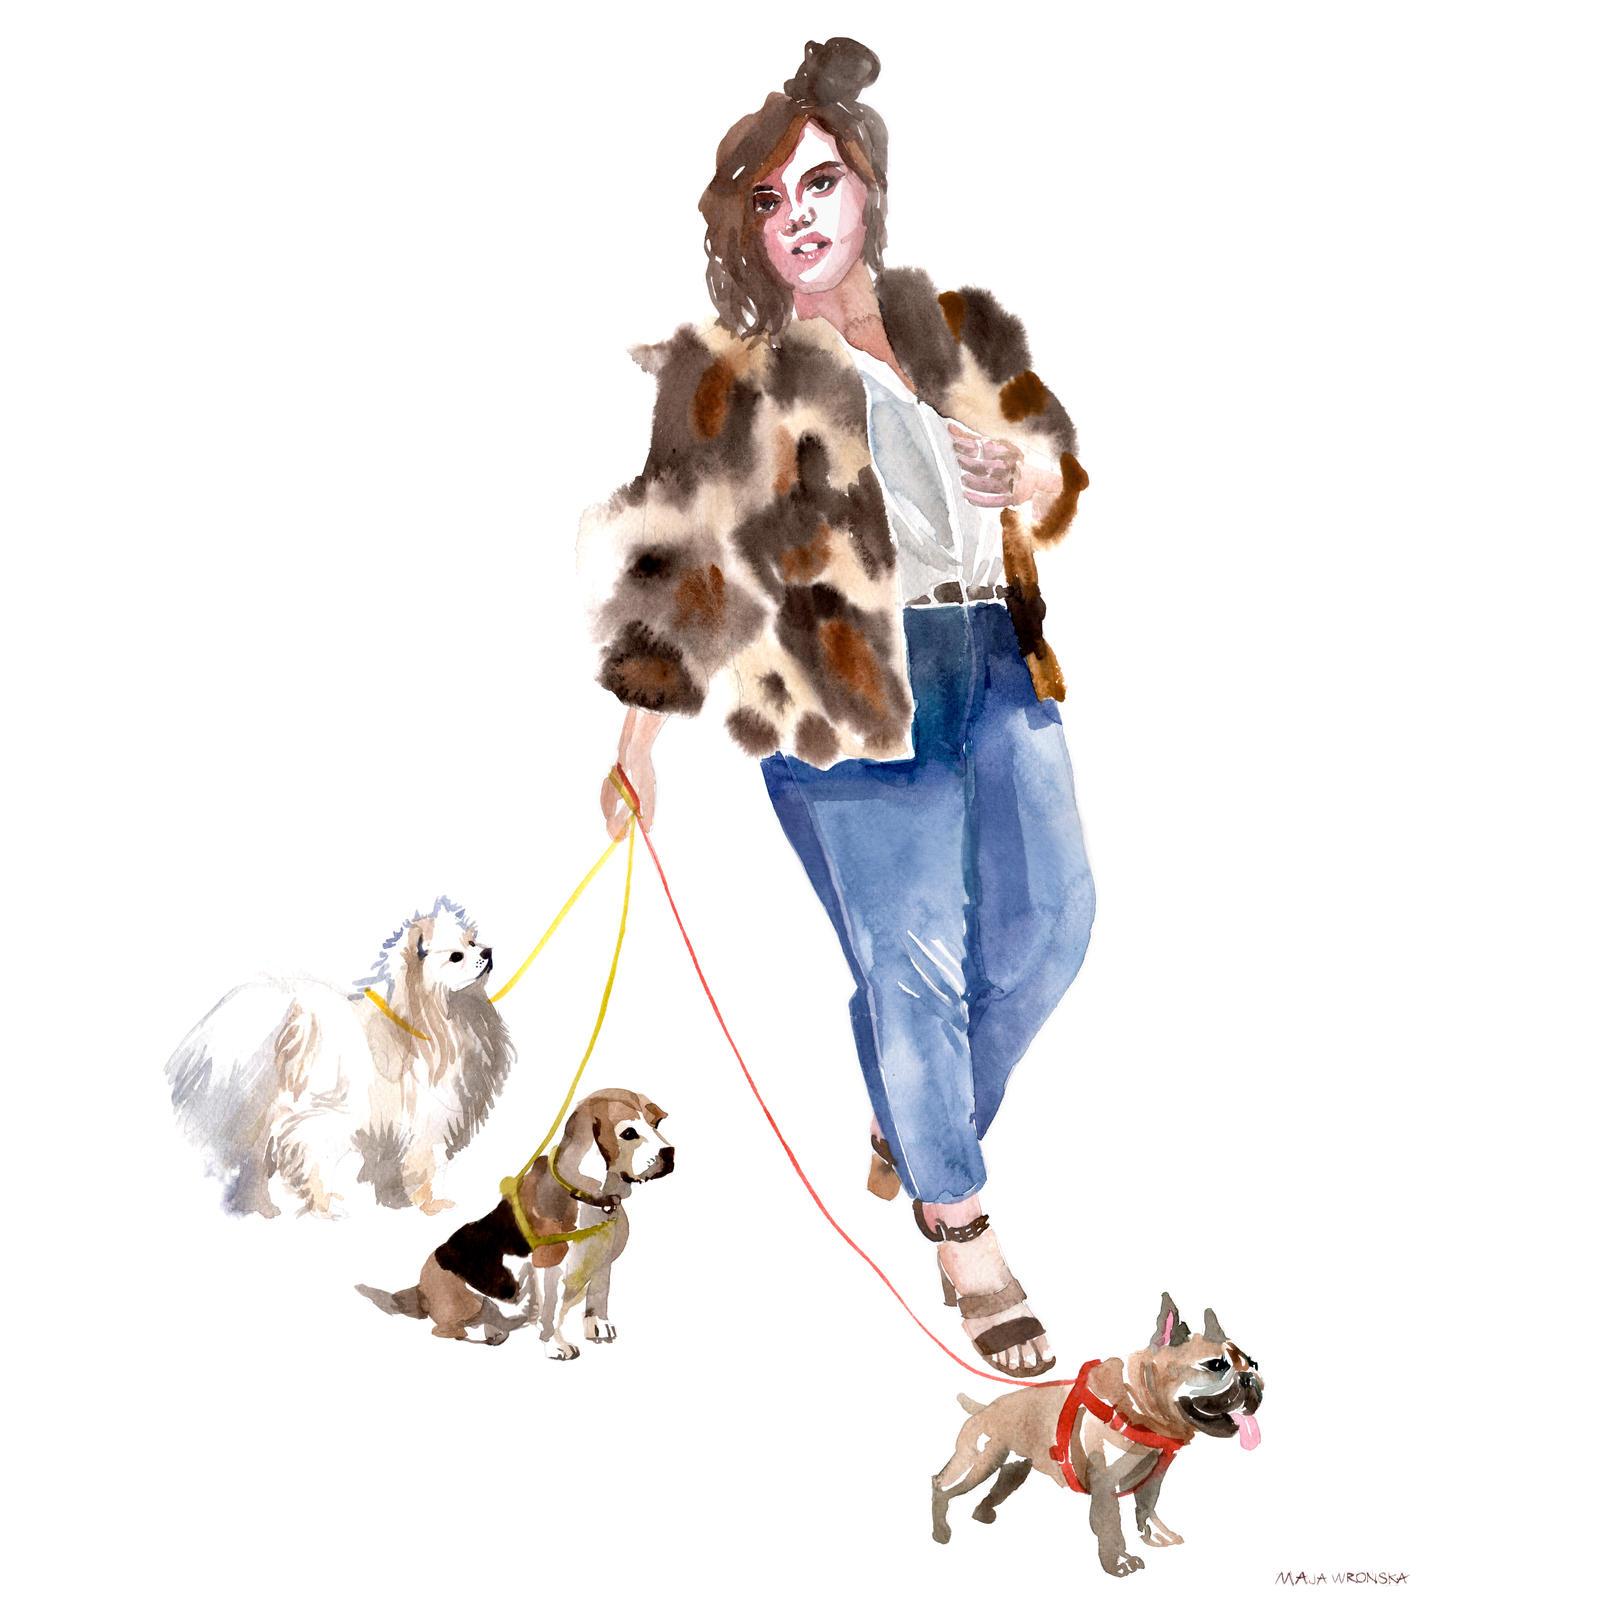 Lady with dogs by takmaj